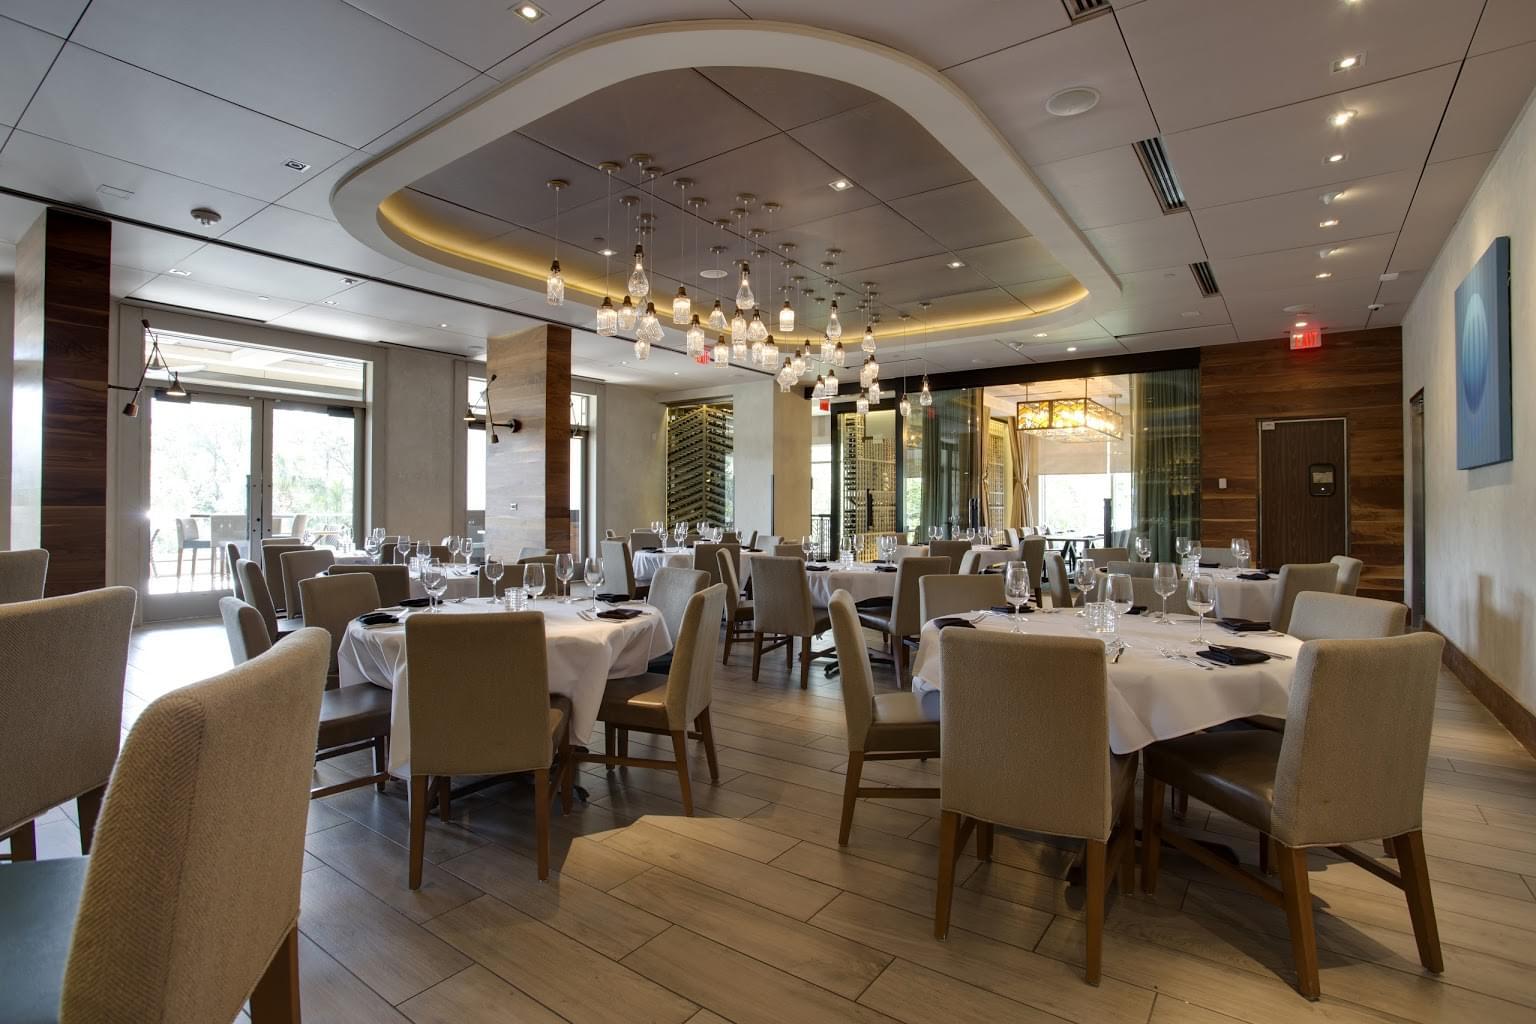 Del Frisco's Double Eagle Steak House Orlando, FL Restaurant upper level dining area